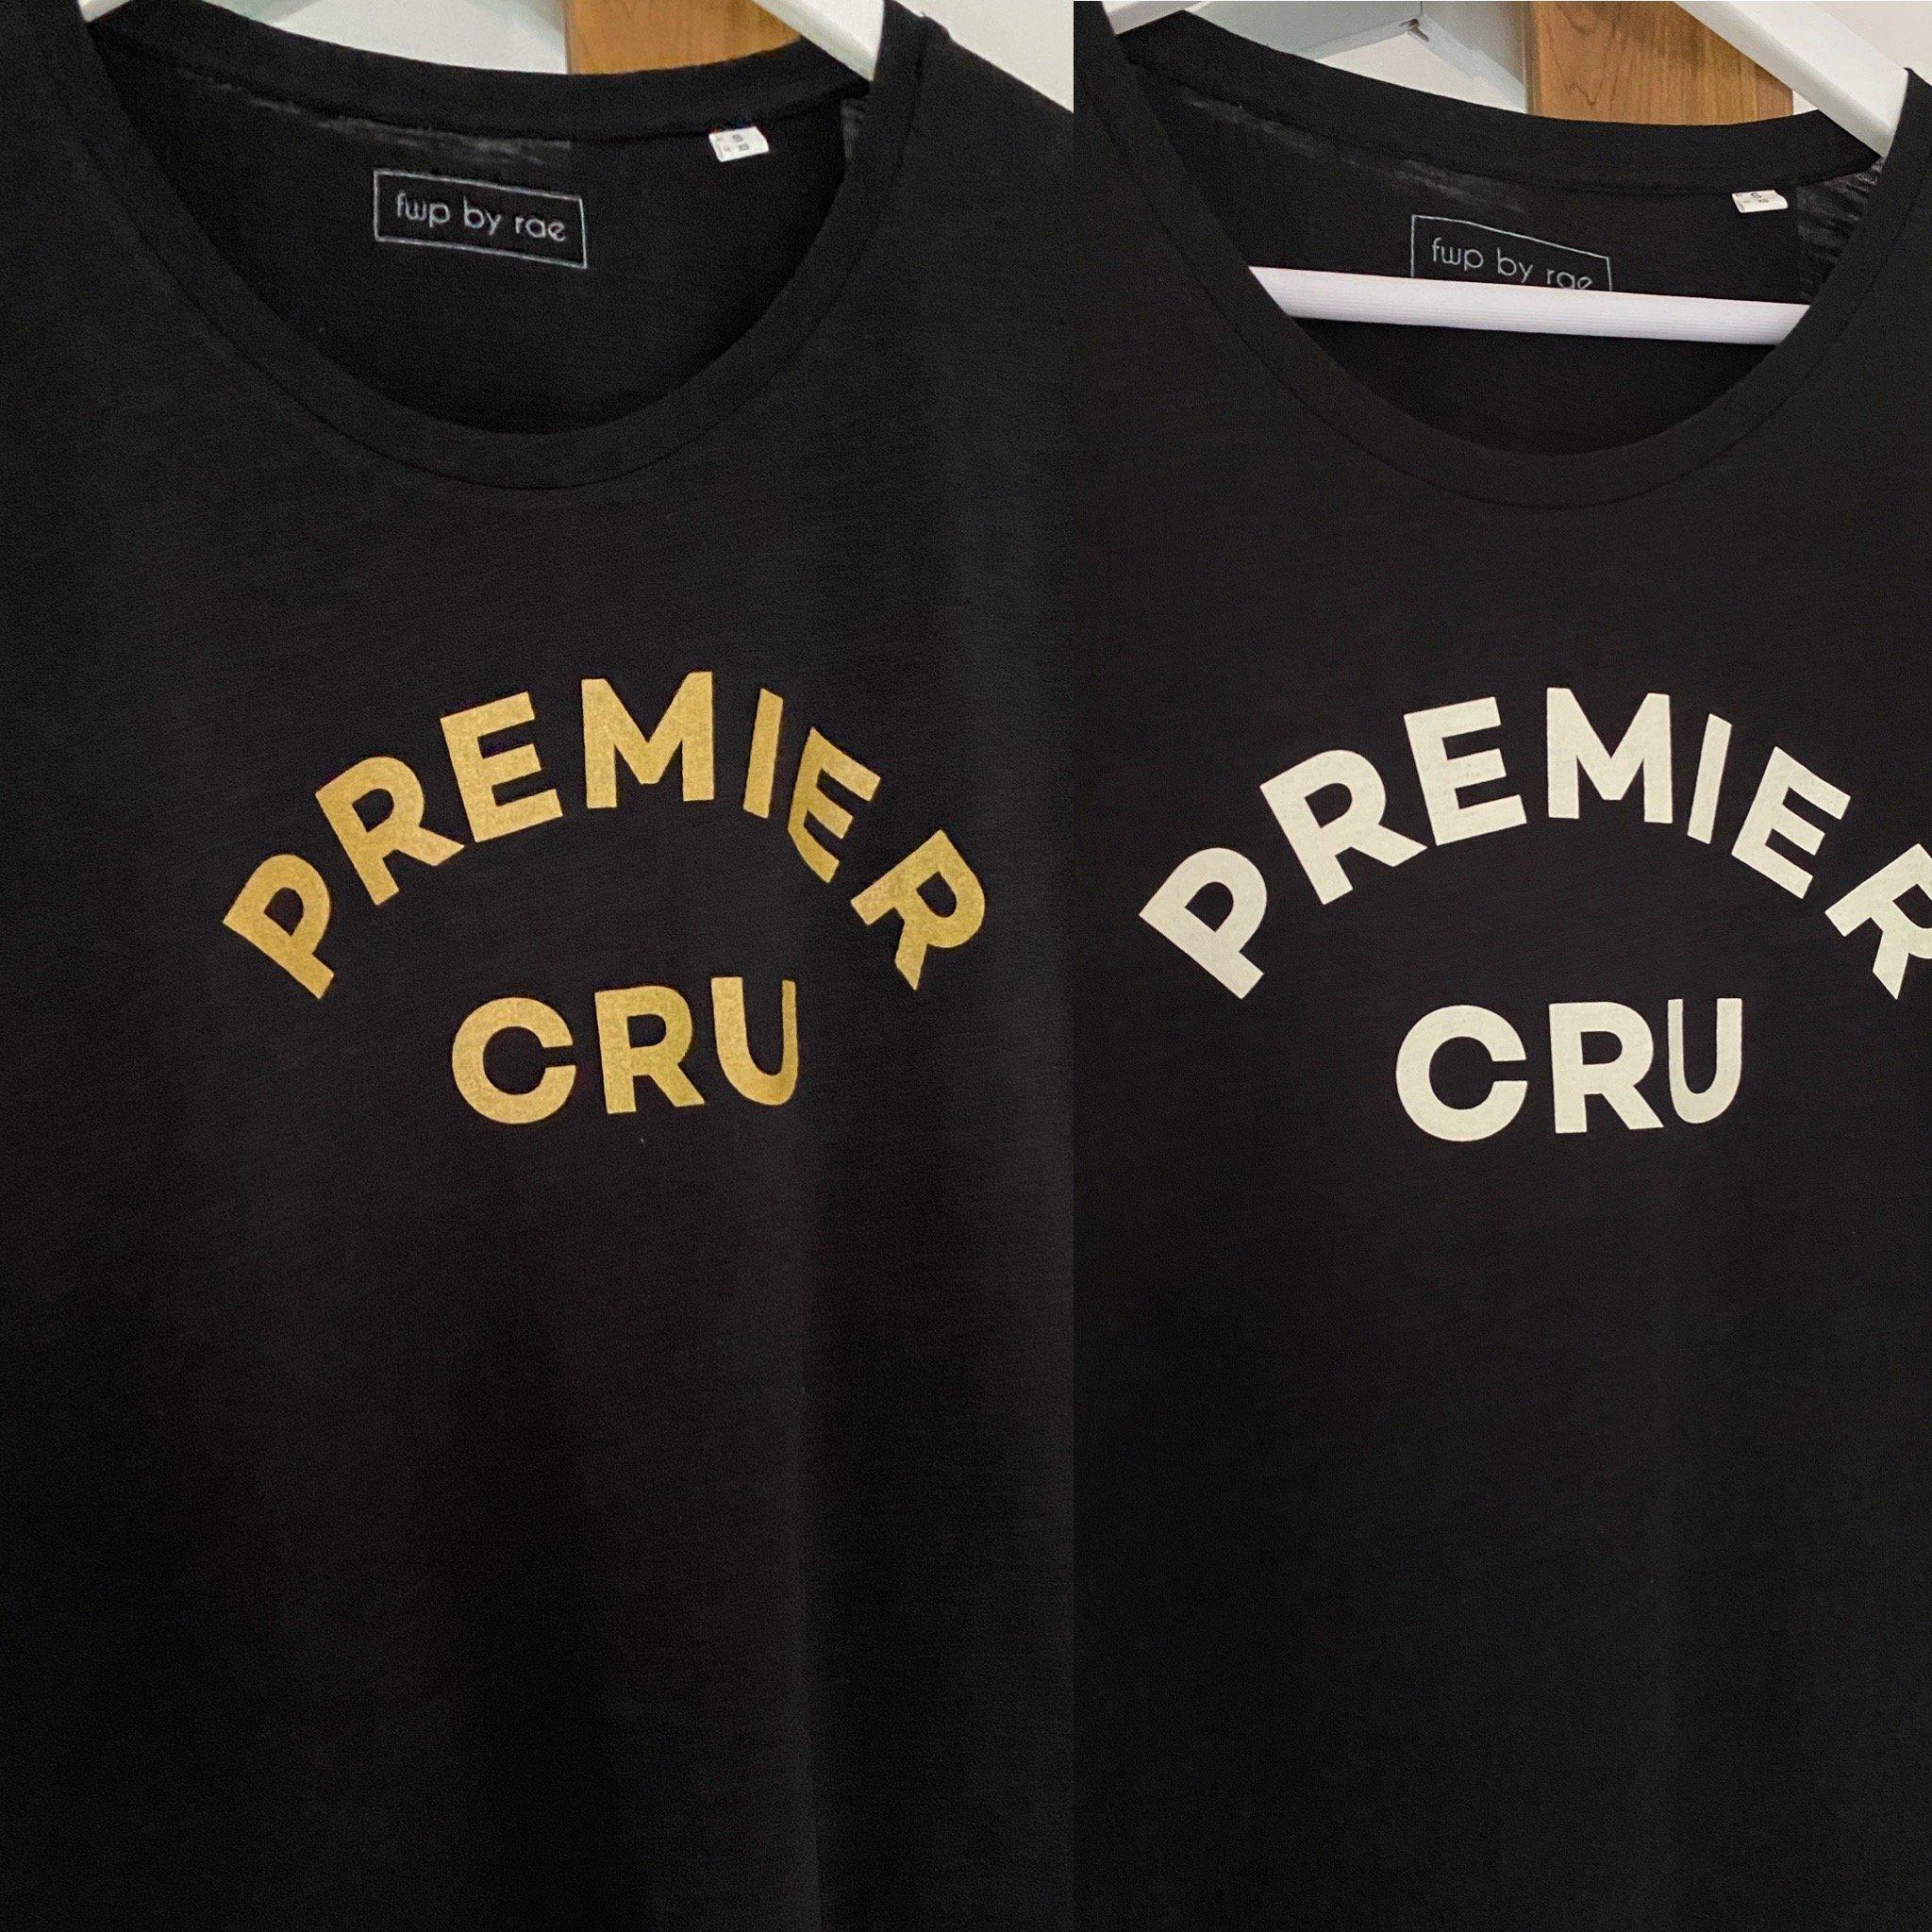 premier cru long sleeve t-shirt